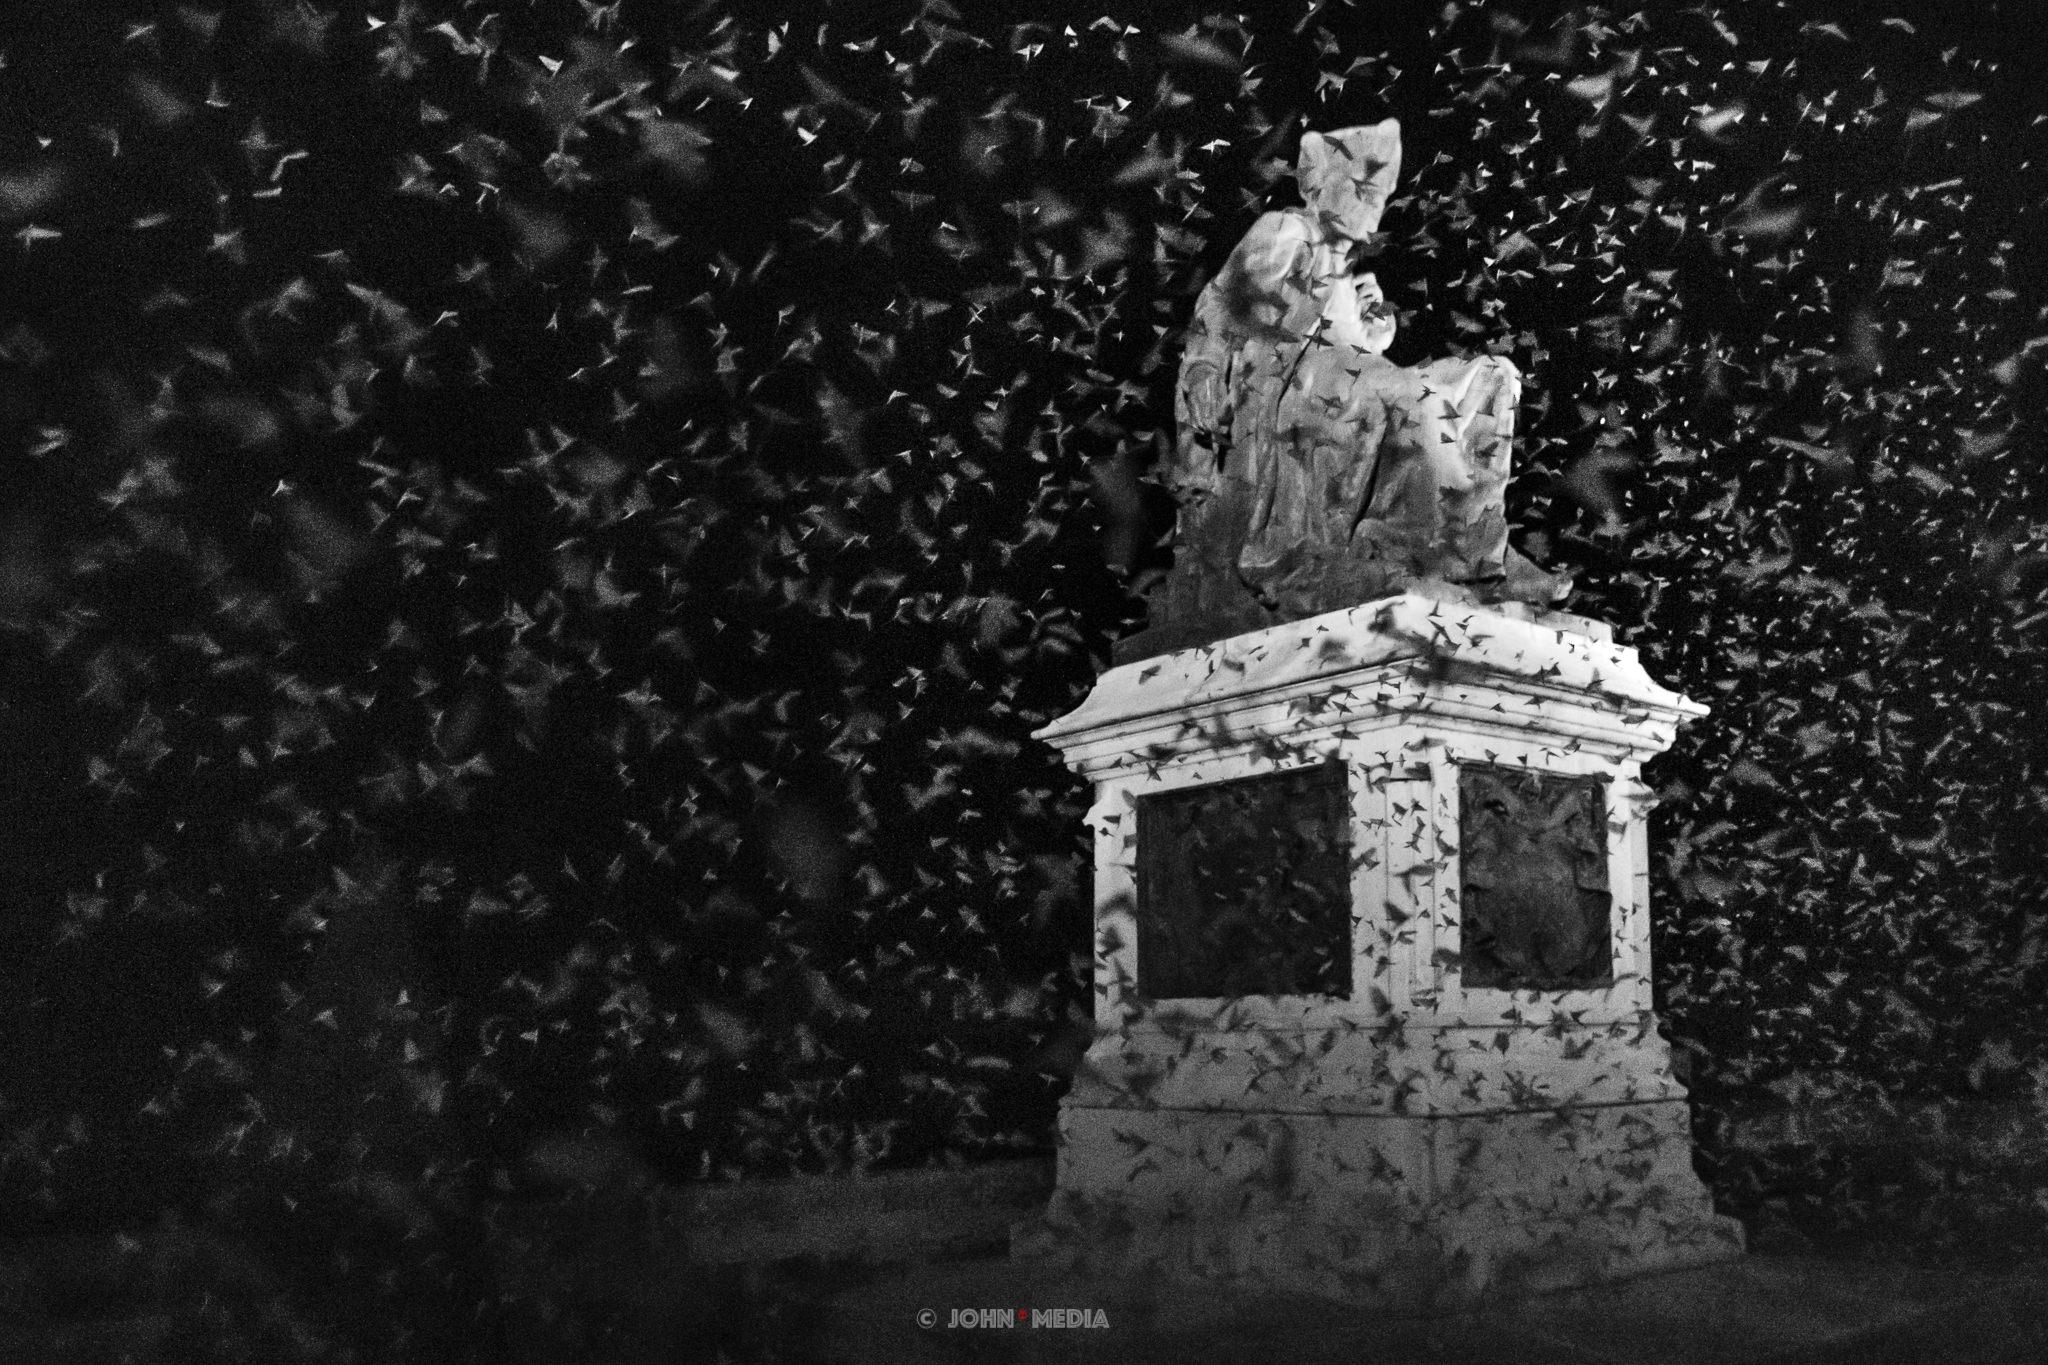 Chinon swarm